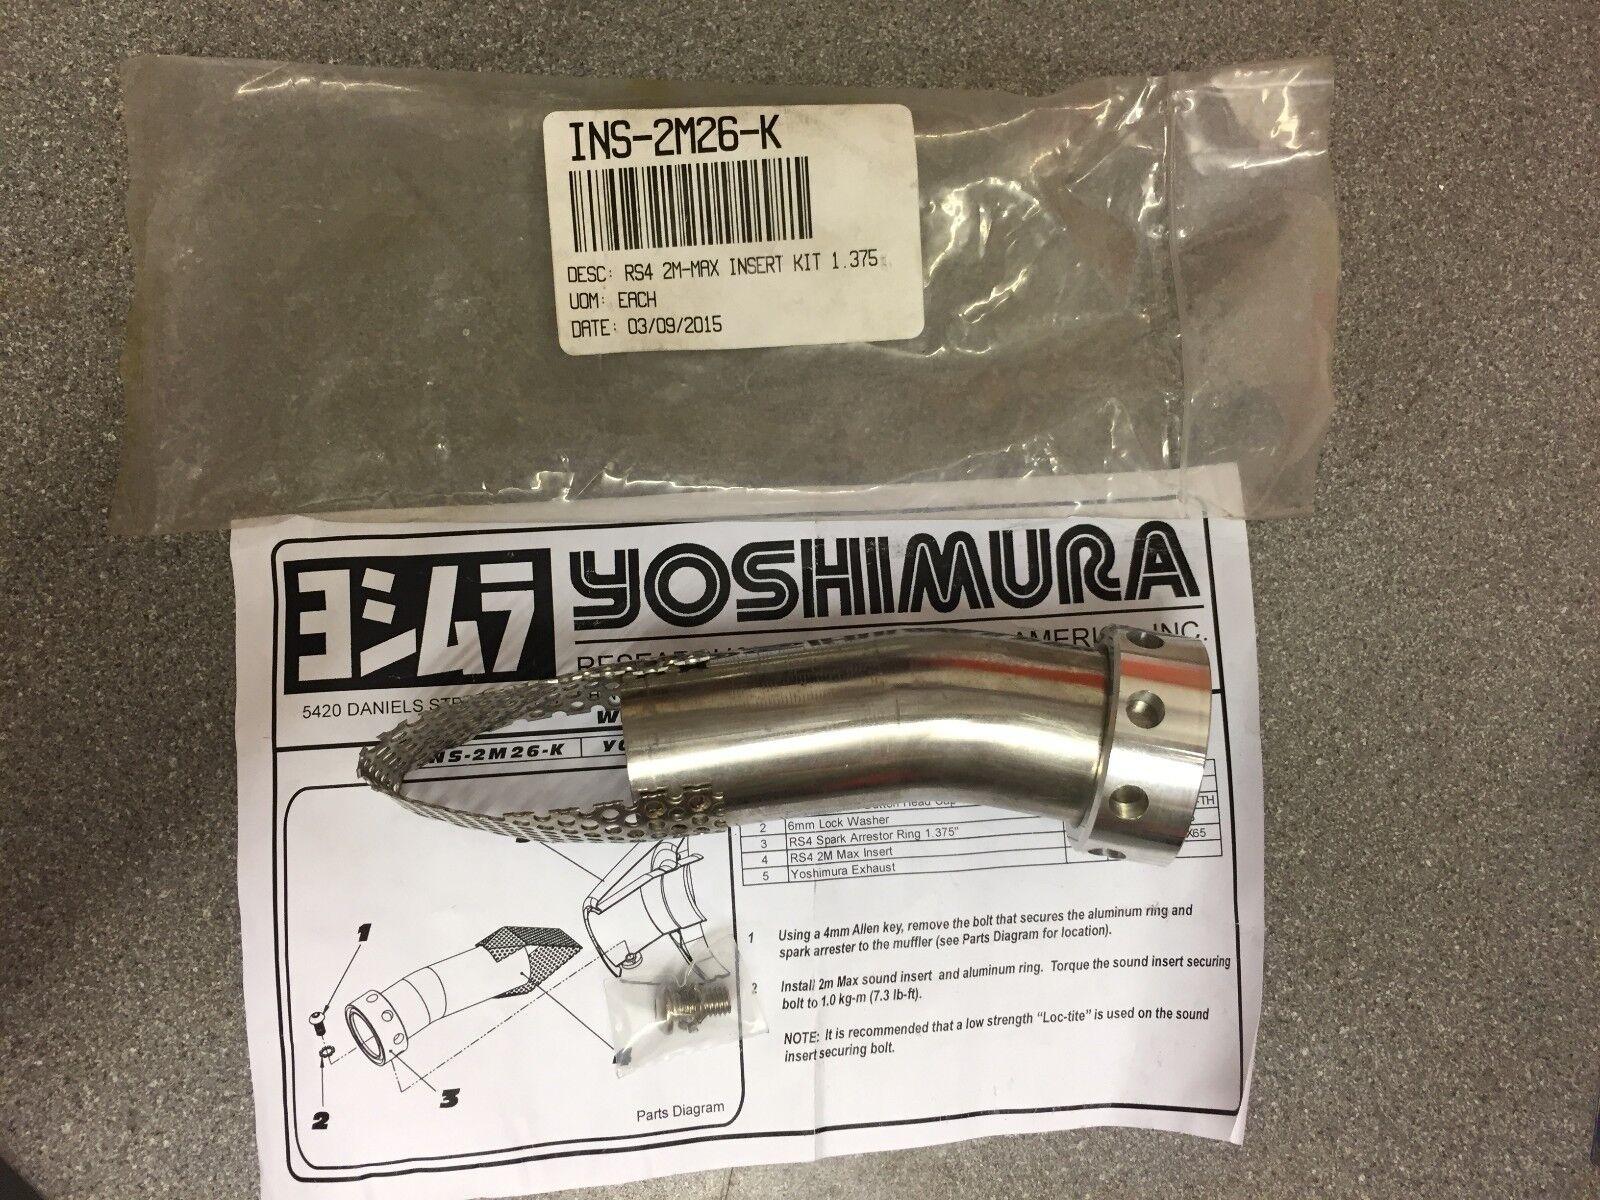 Yoshimura RS-4 Spark Arrestor Insert Kit 1.375